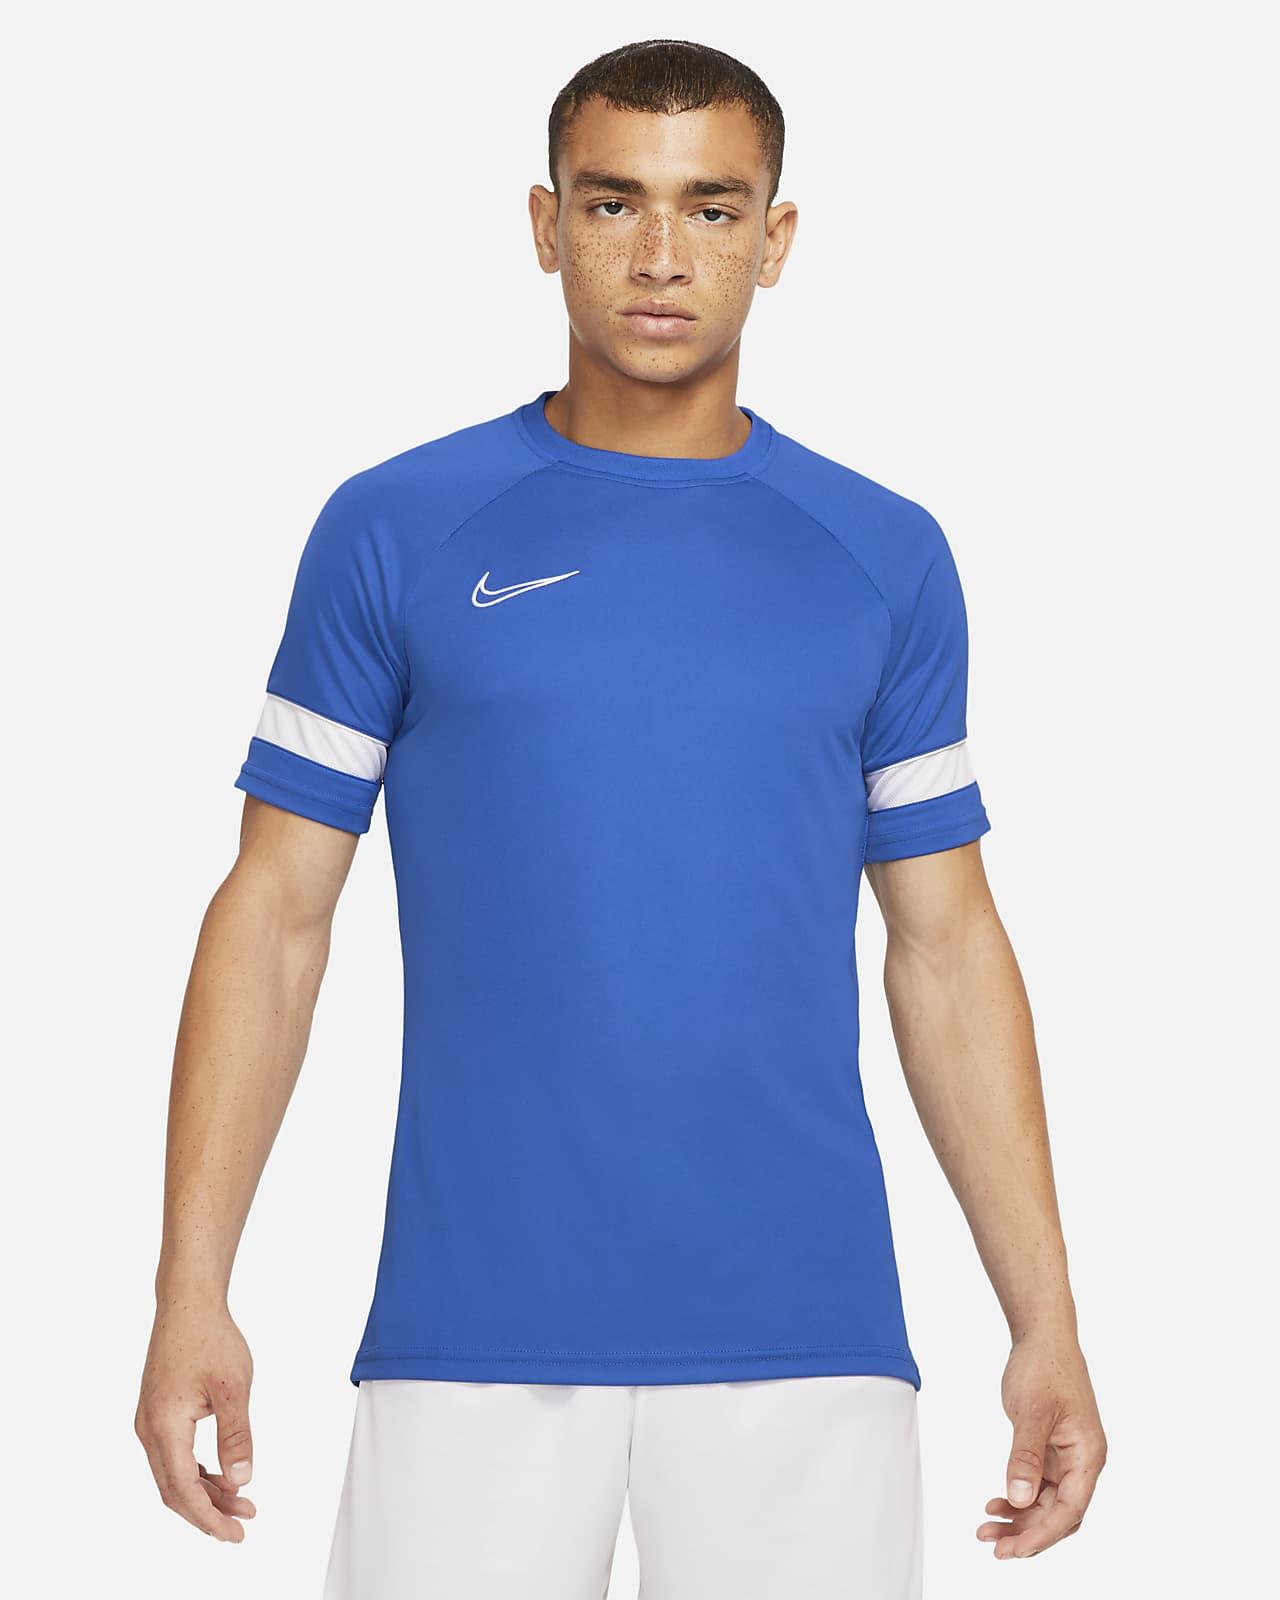 Nike Dri-FIT Academy Men's Short-Sleeve Football Top